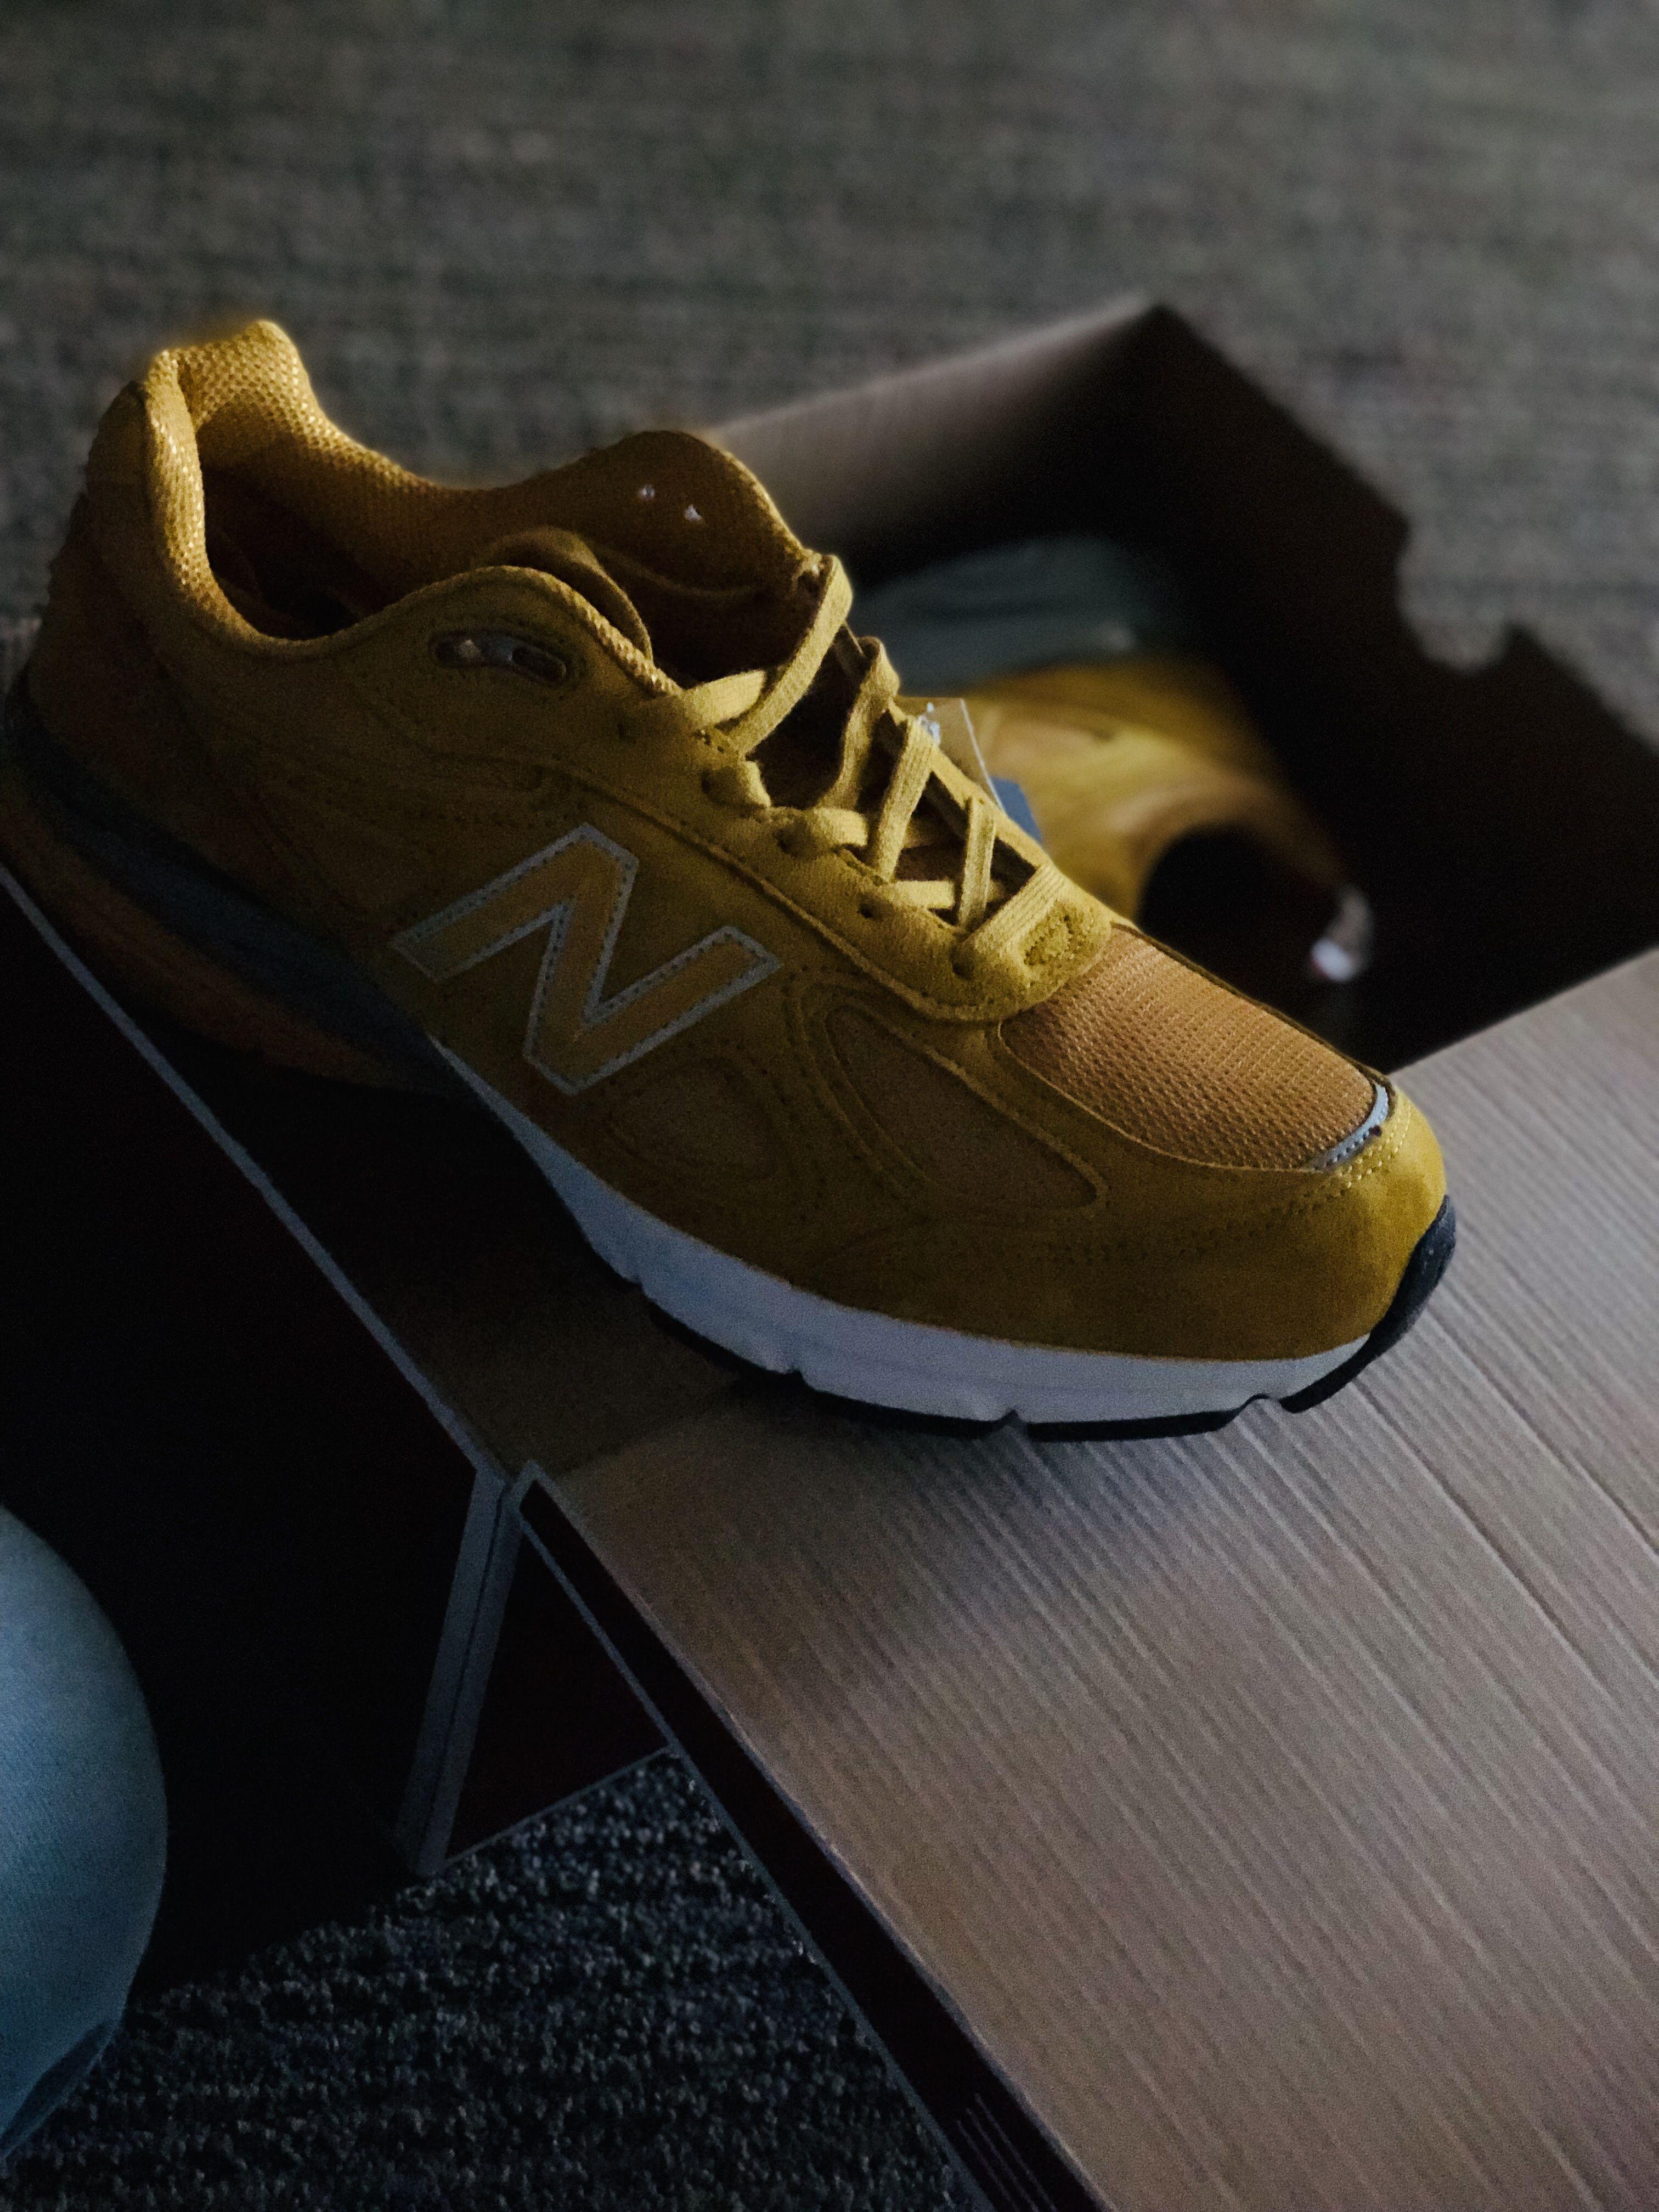 New balance sneaker, New balance, Sneakers